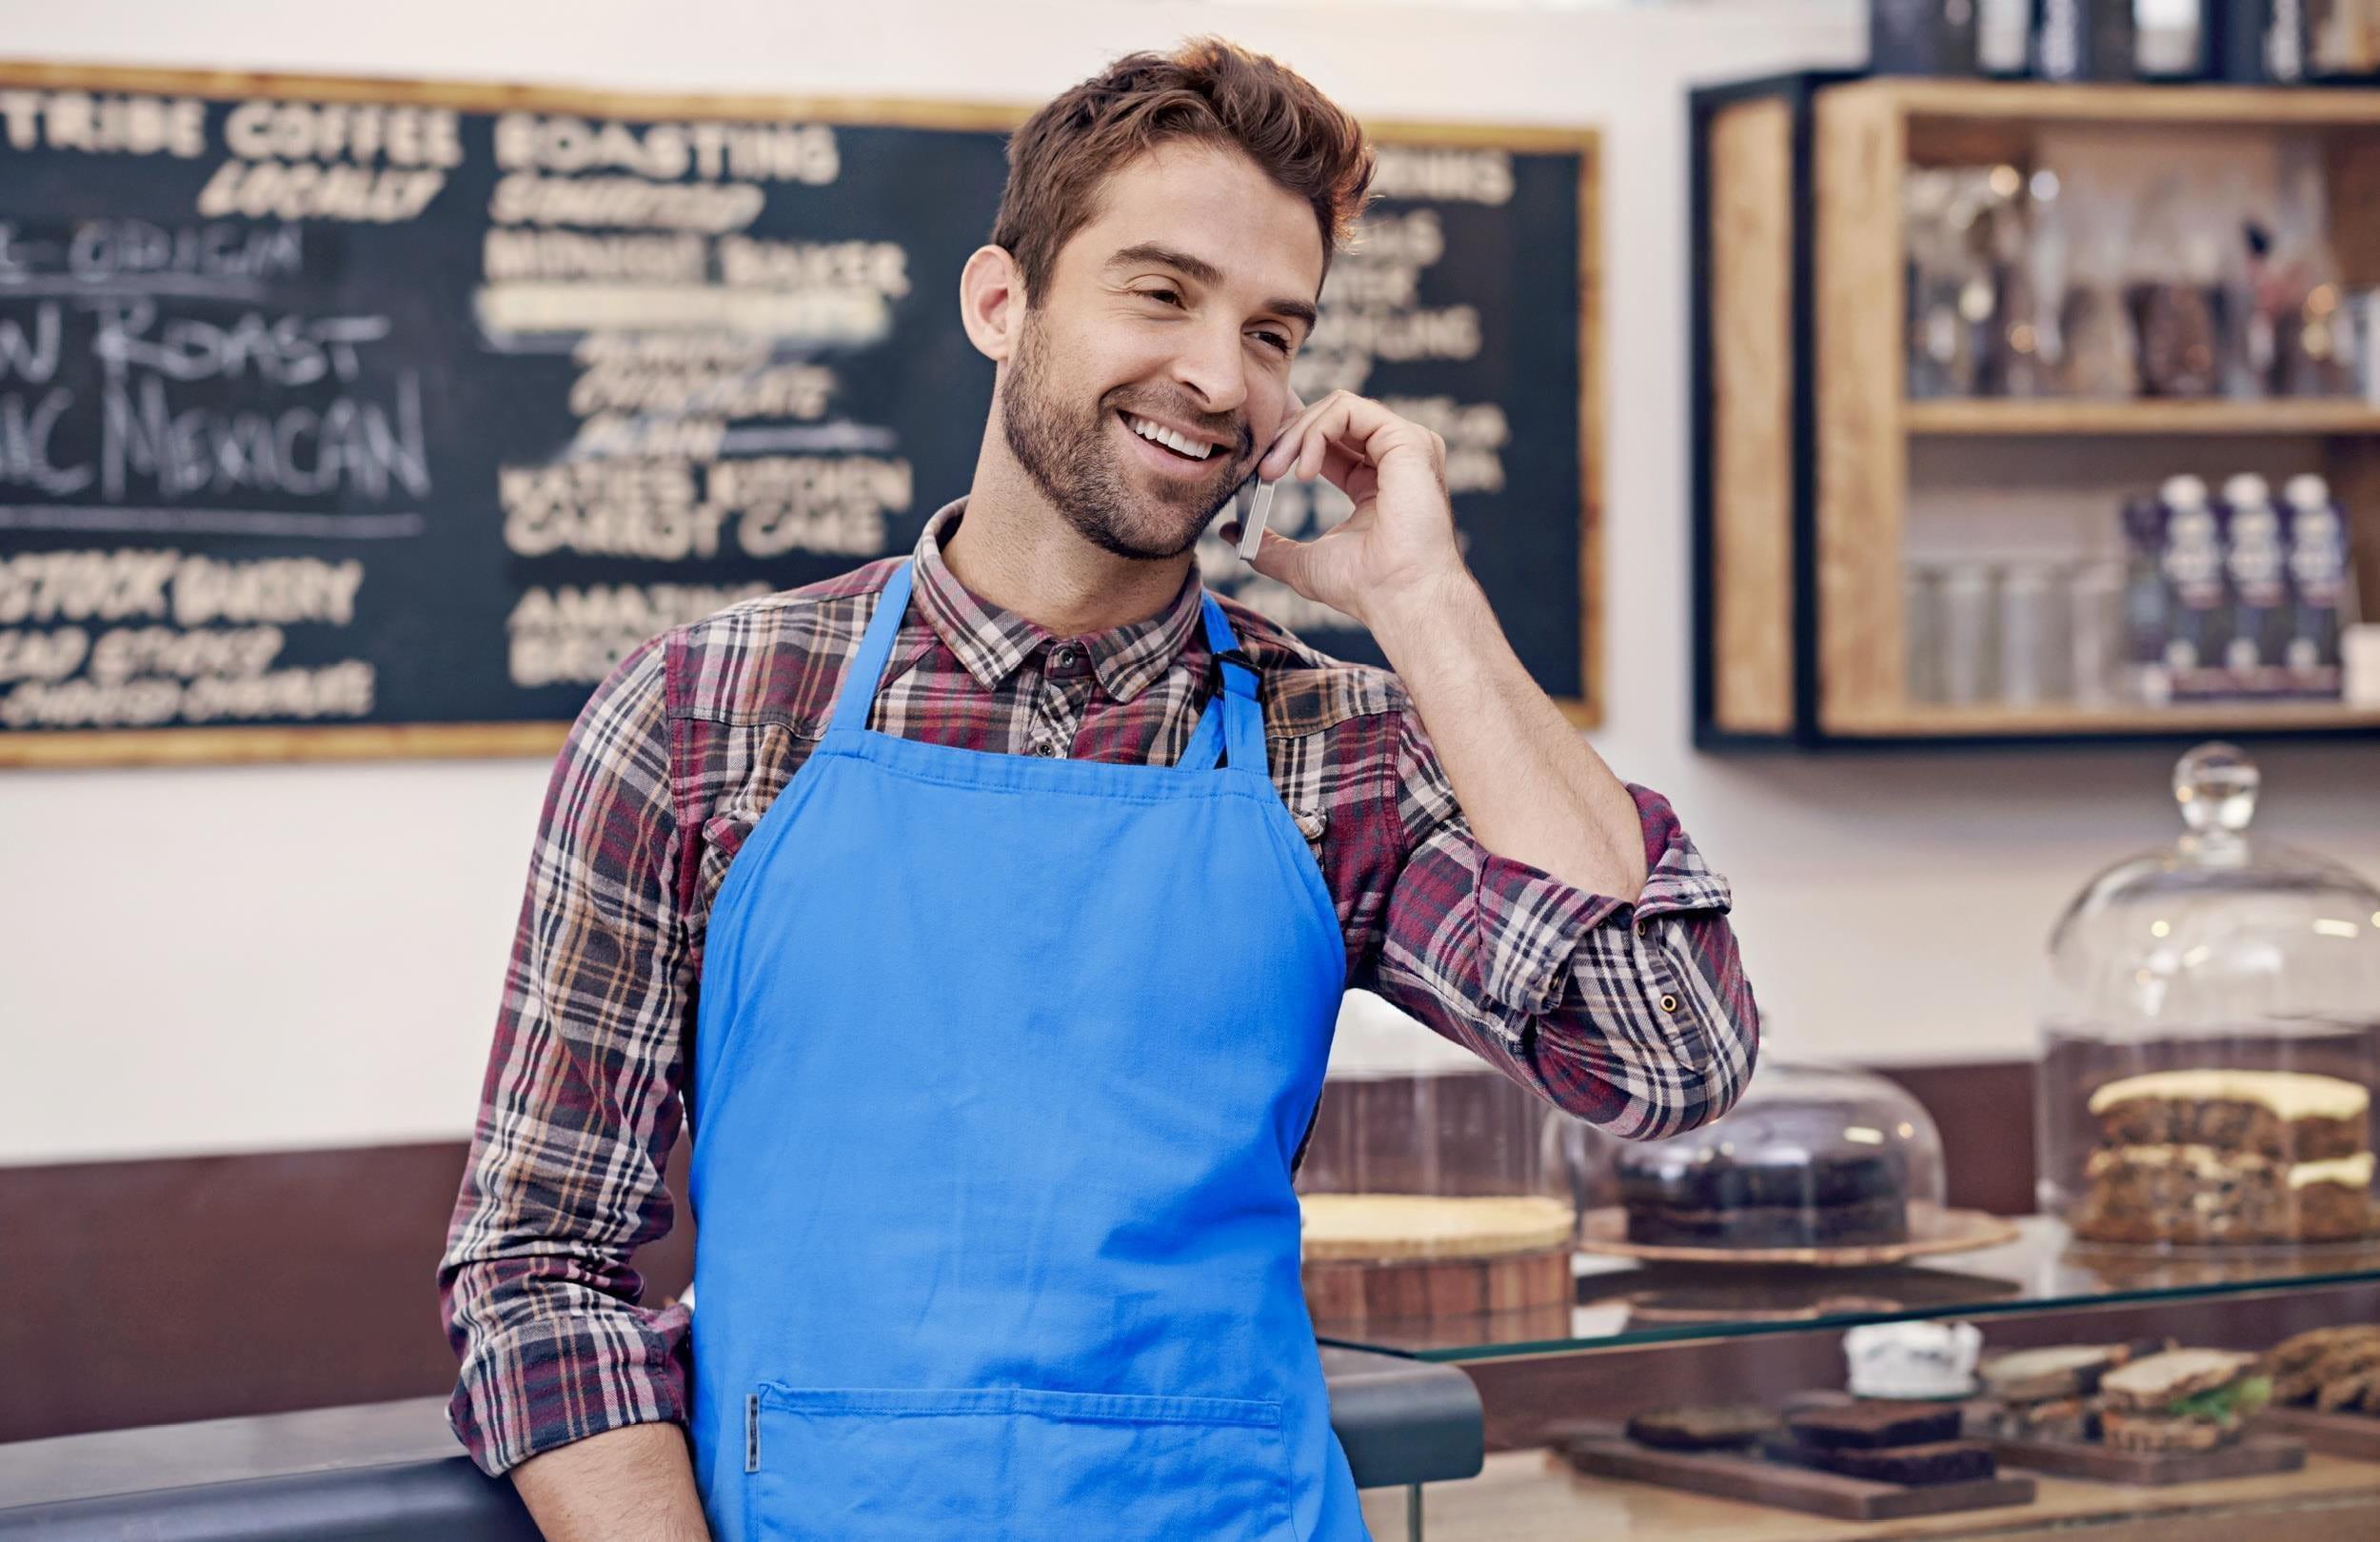 Phoning homme en tablier bleu